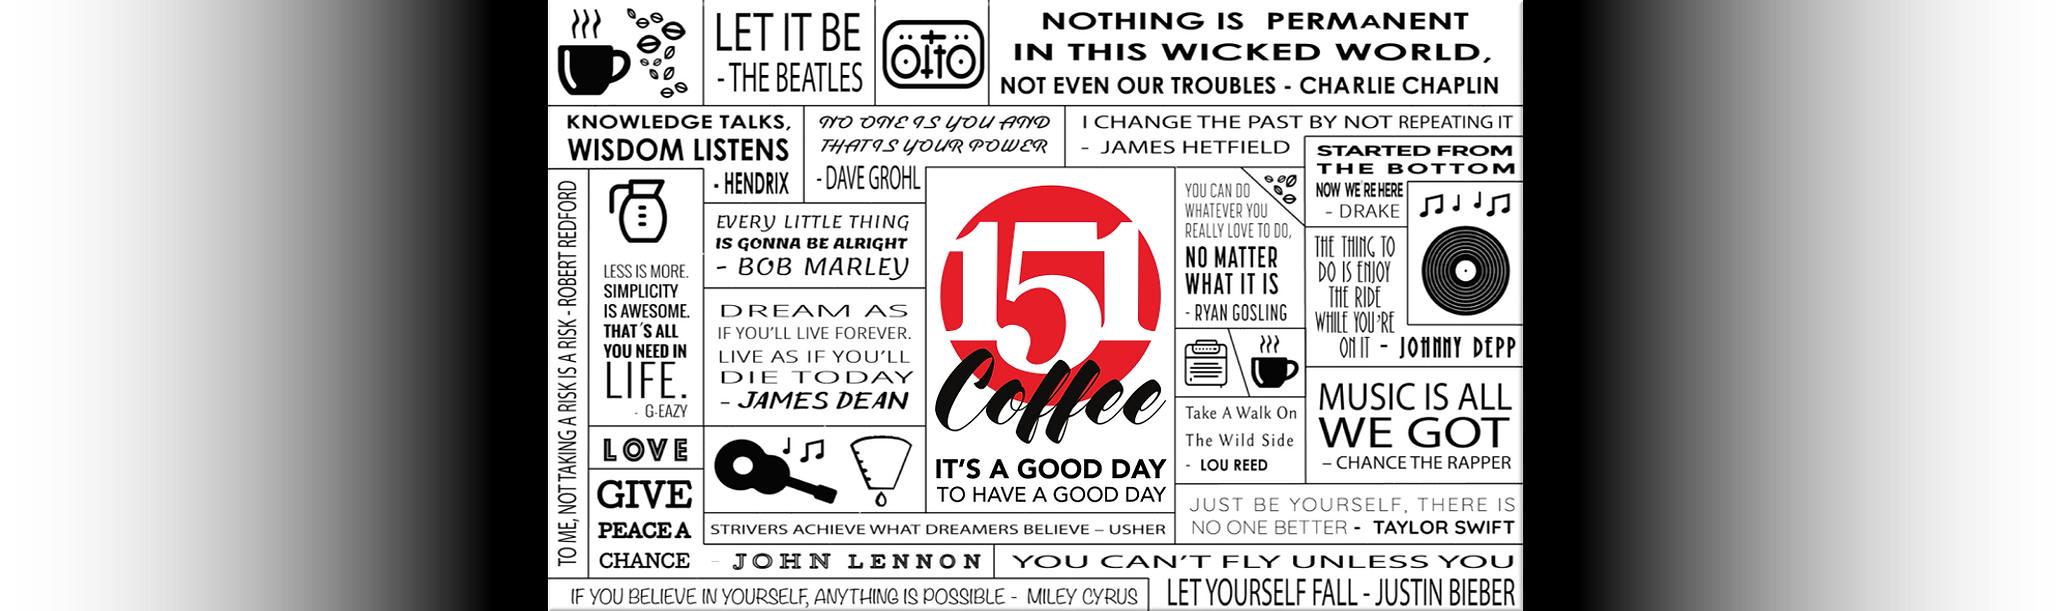 151 Coffee | Drive-Thru Coffee | Dallas-Fort Worth, Texas